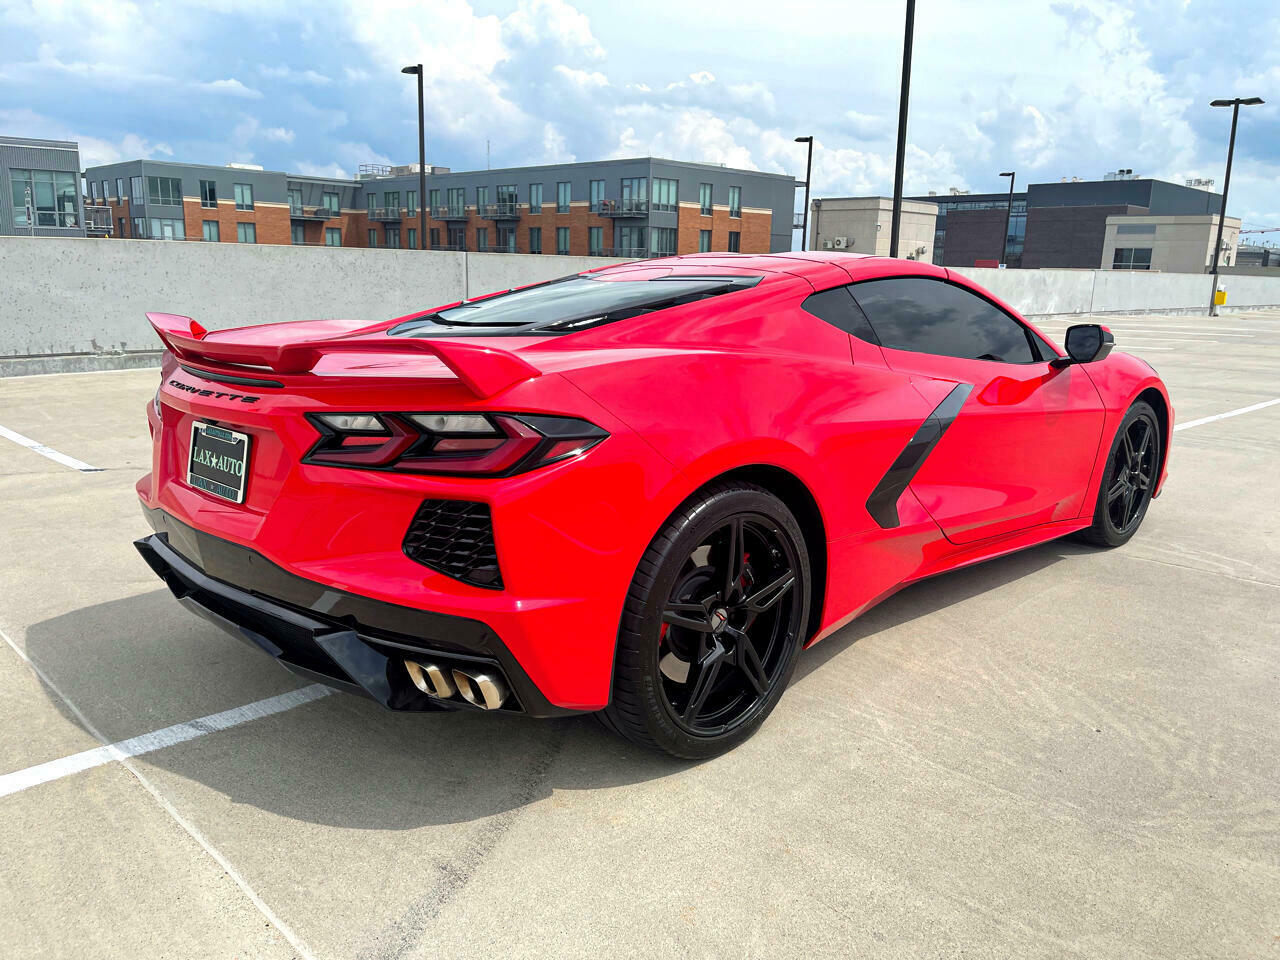 2020 Red Chevrolet Corvette Coupe 1LT | C7 Corvette Photo 5